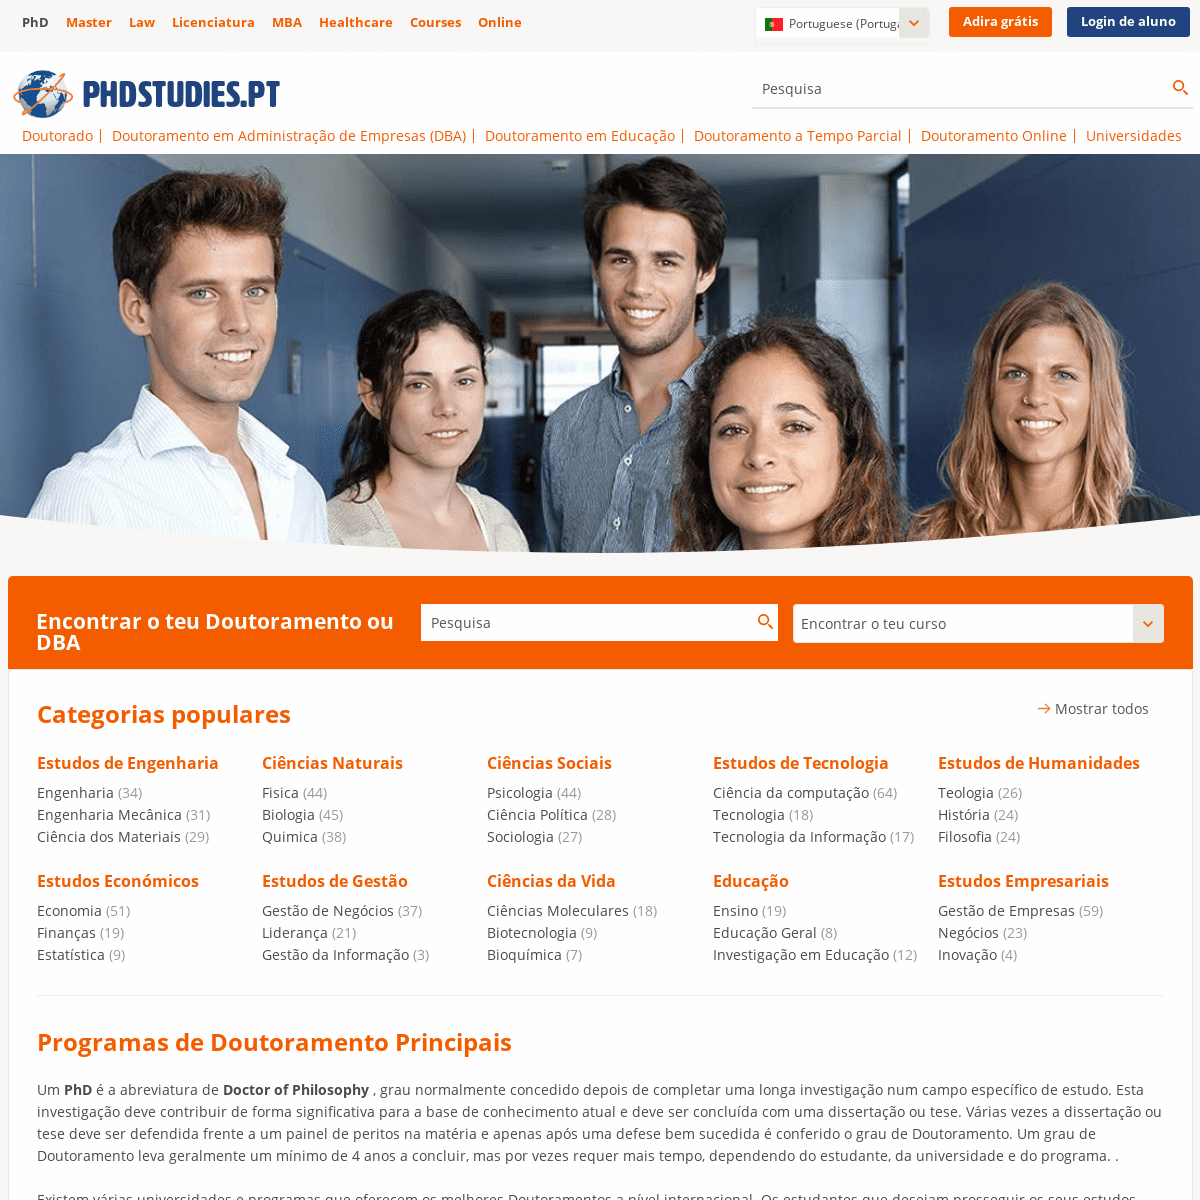 PhDStudies